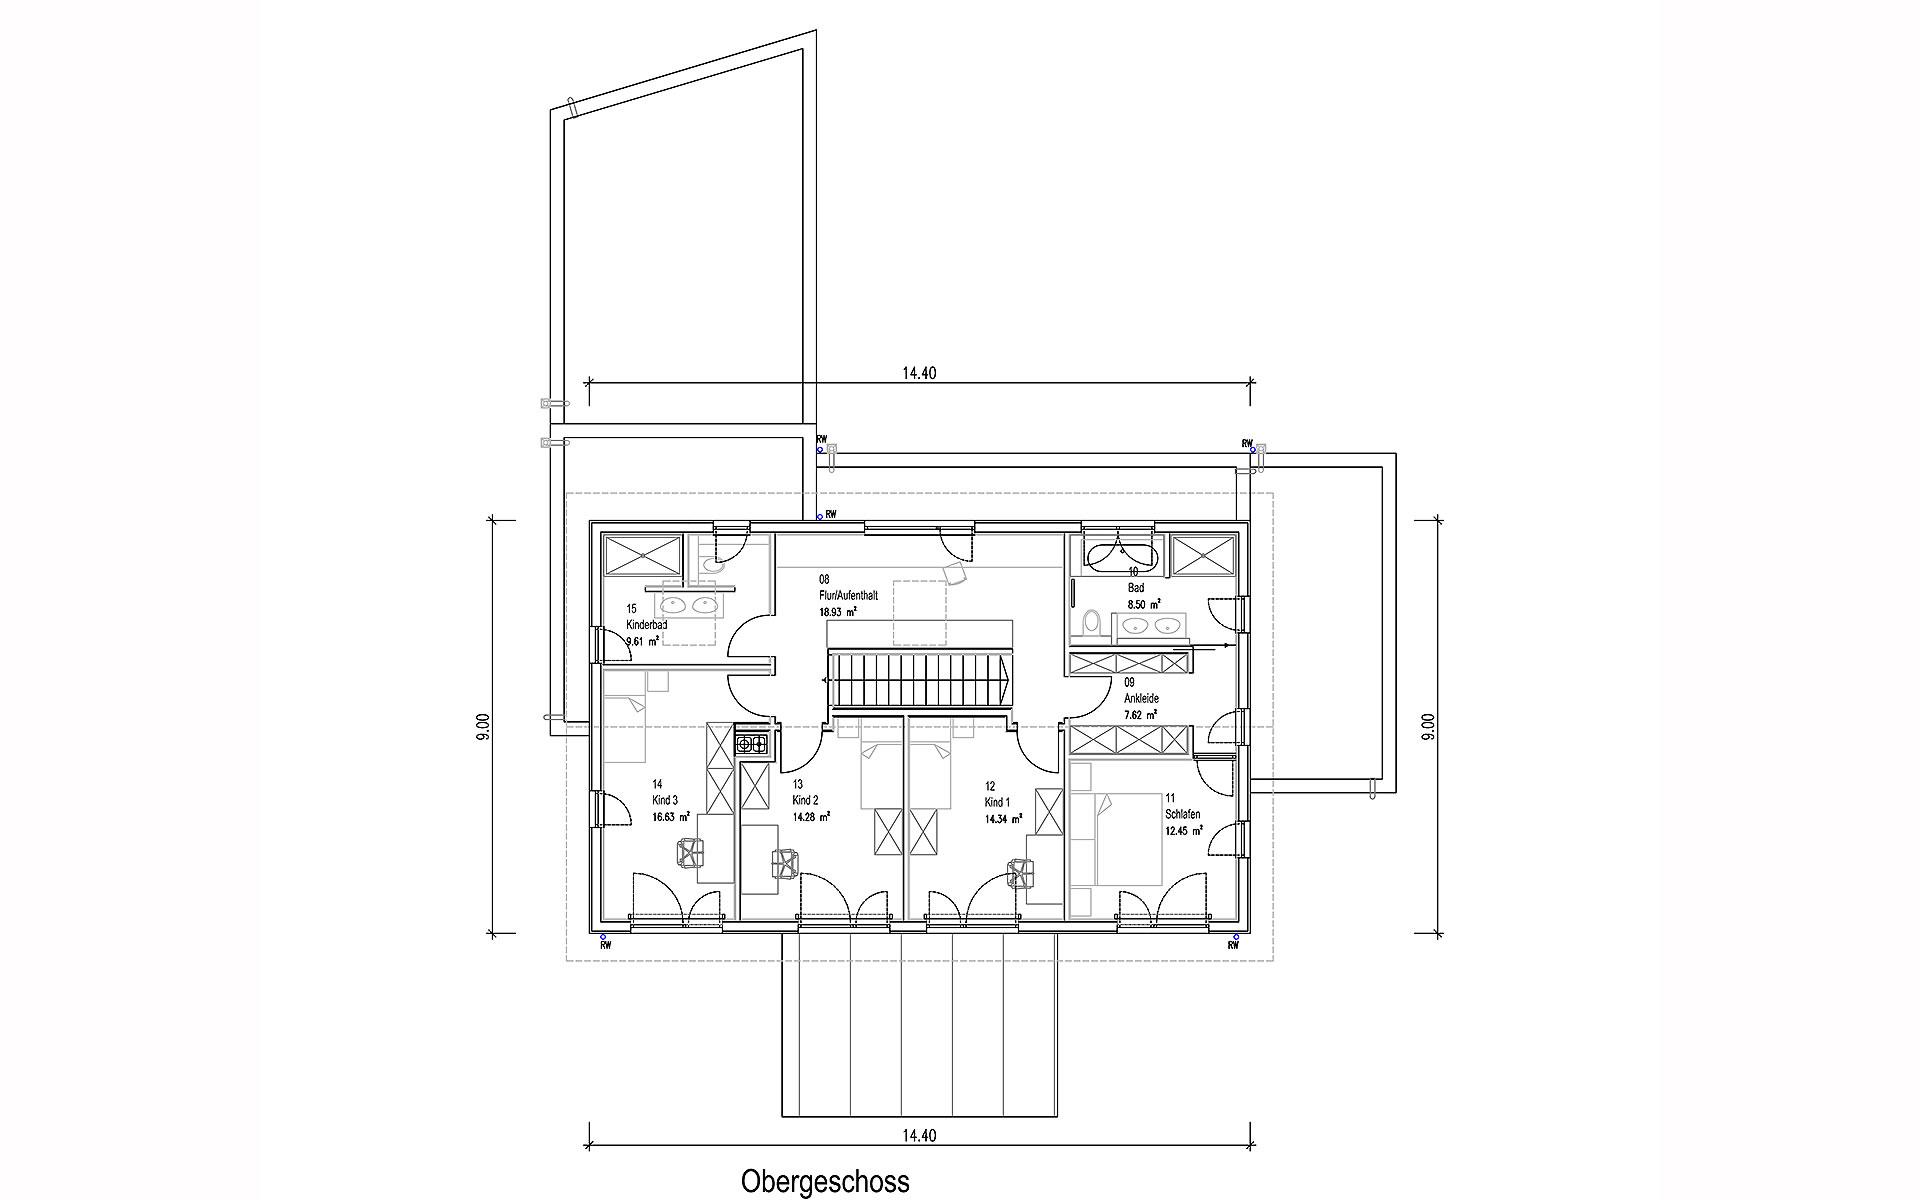 Obergeschoss Oberndorf von Sonnleitner Holzbauwerke GmbH & Co. KG